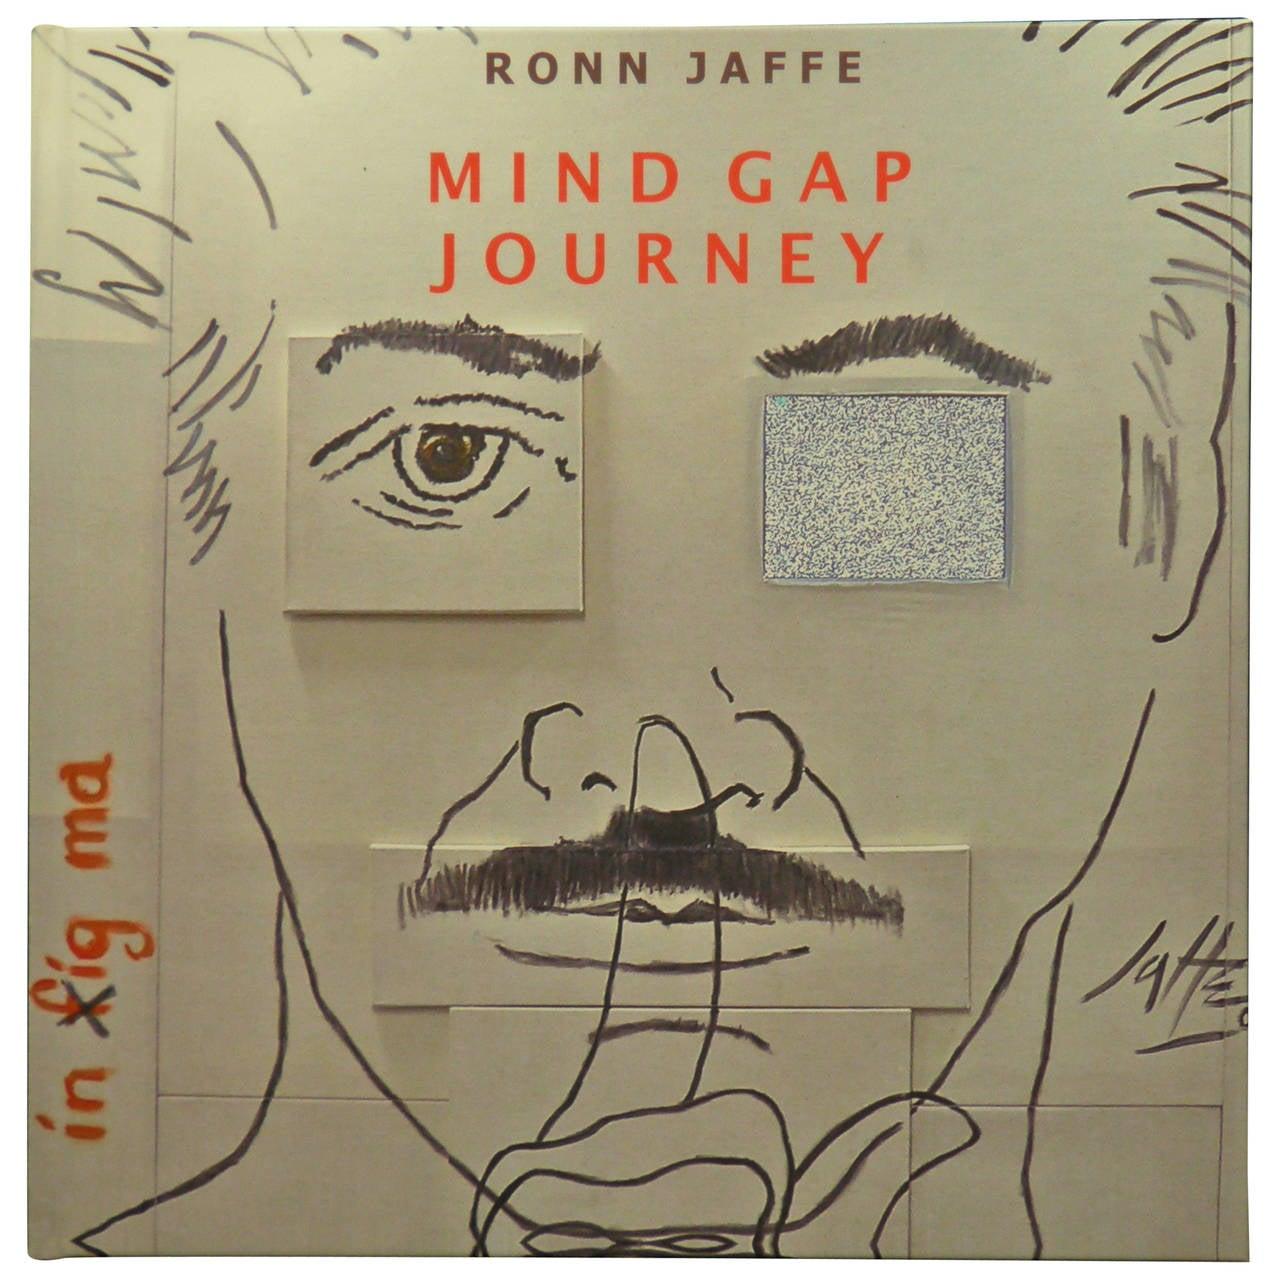 Noted Cutting-Edge Artist Ronn Jaffe's Monograph, 'Mind Gap Journey 21C'